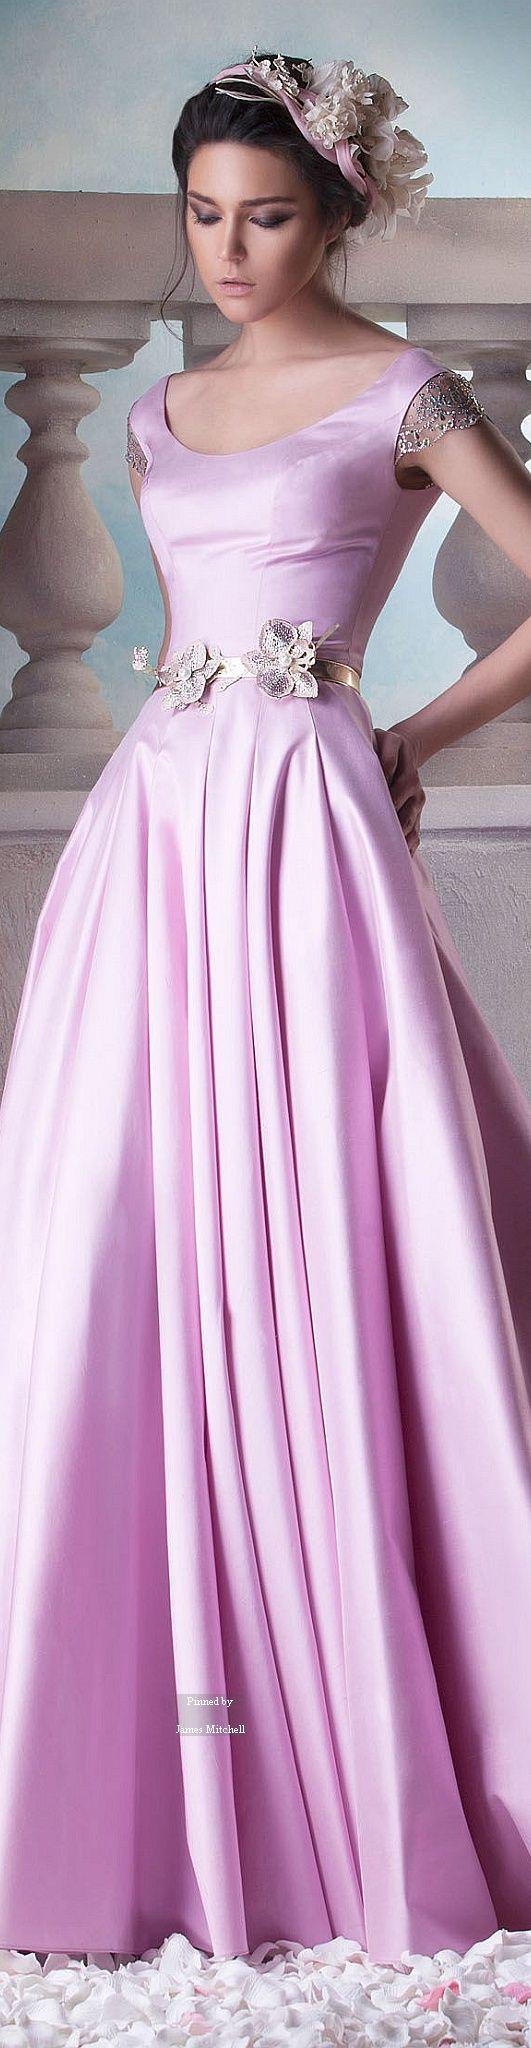 1804 best bodas images on Pinterest | Lace weddings, Wedding ...